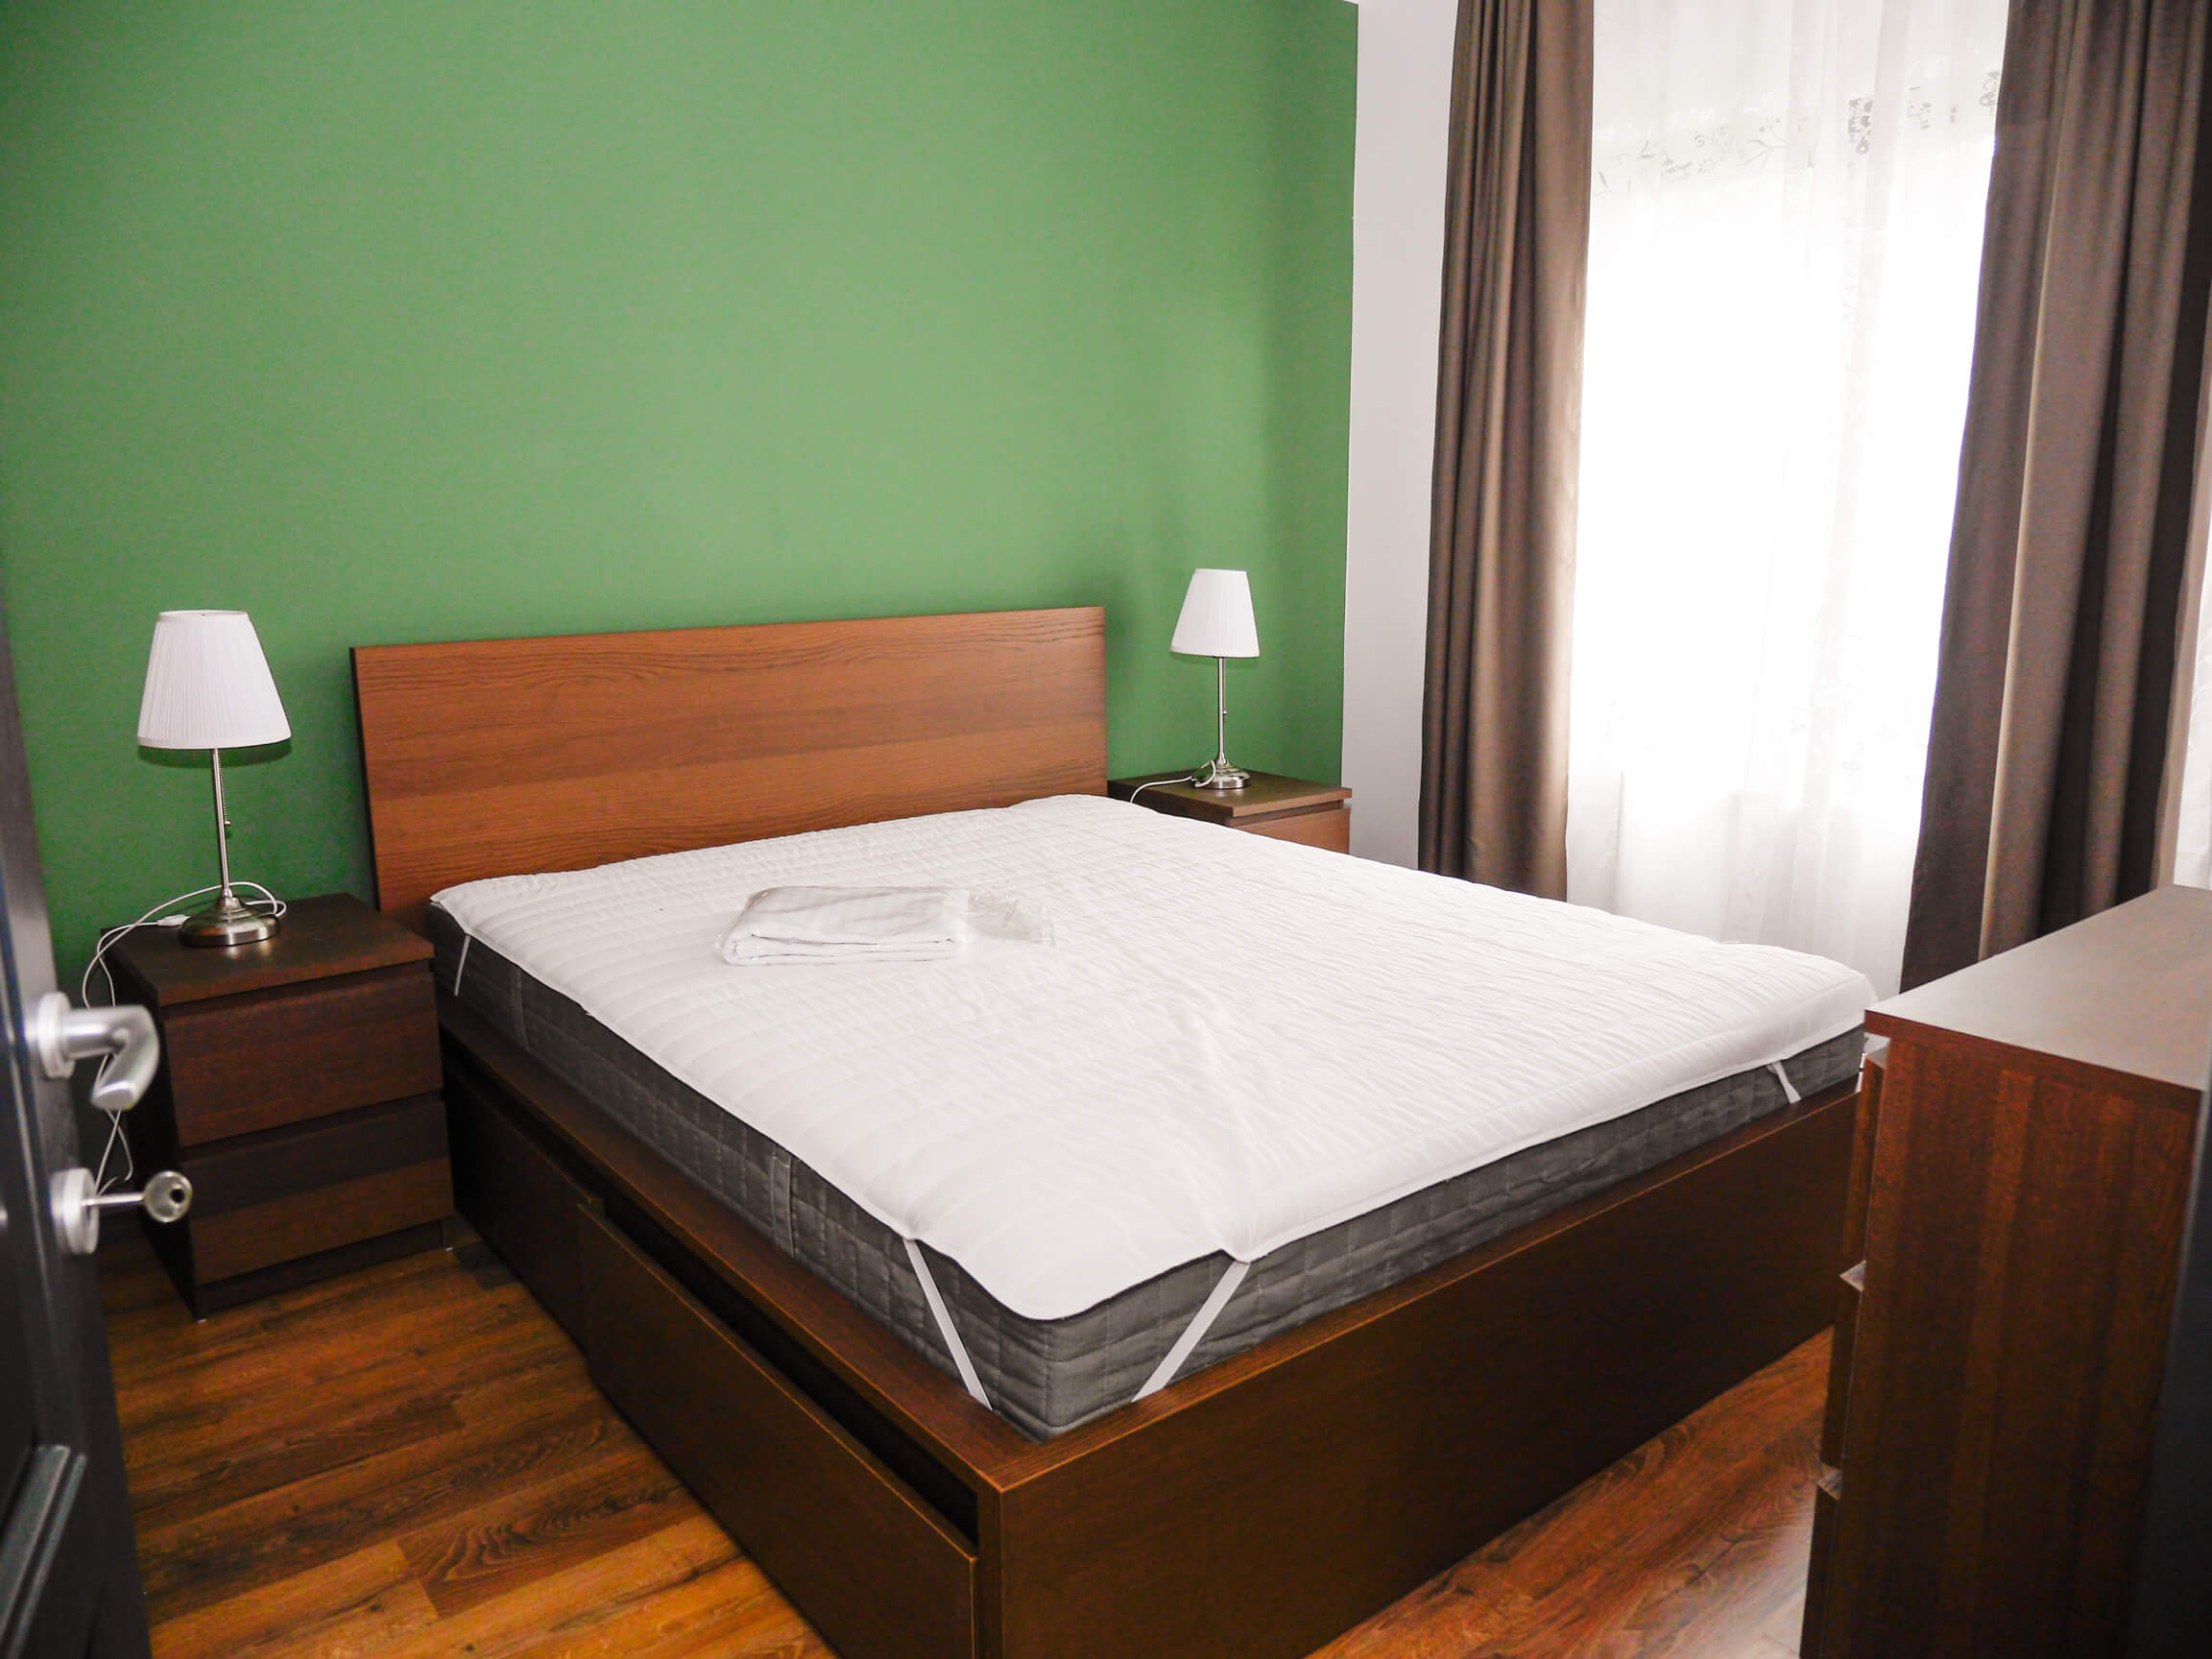 Clement Apartments - apartamente de inchiriat in regim hotelier - cazare neamt - cazare piatra neamt (6)